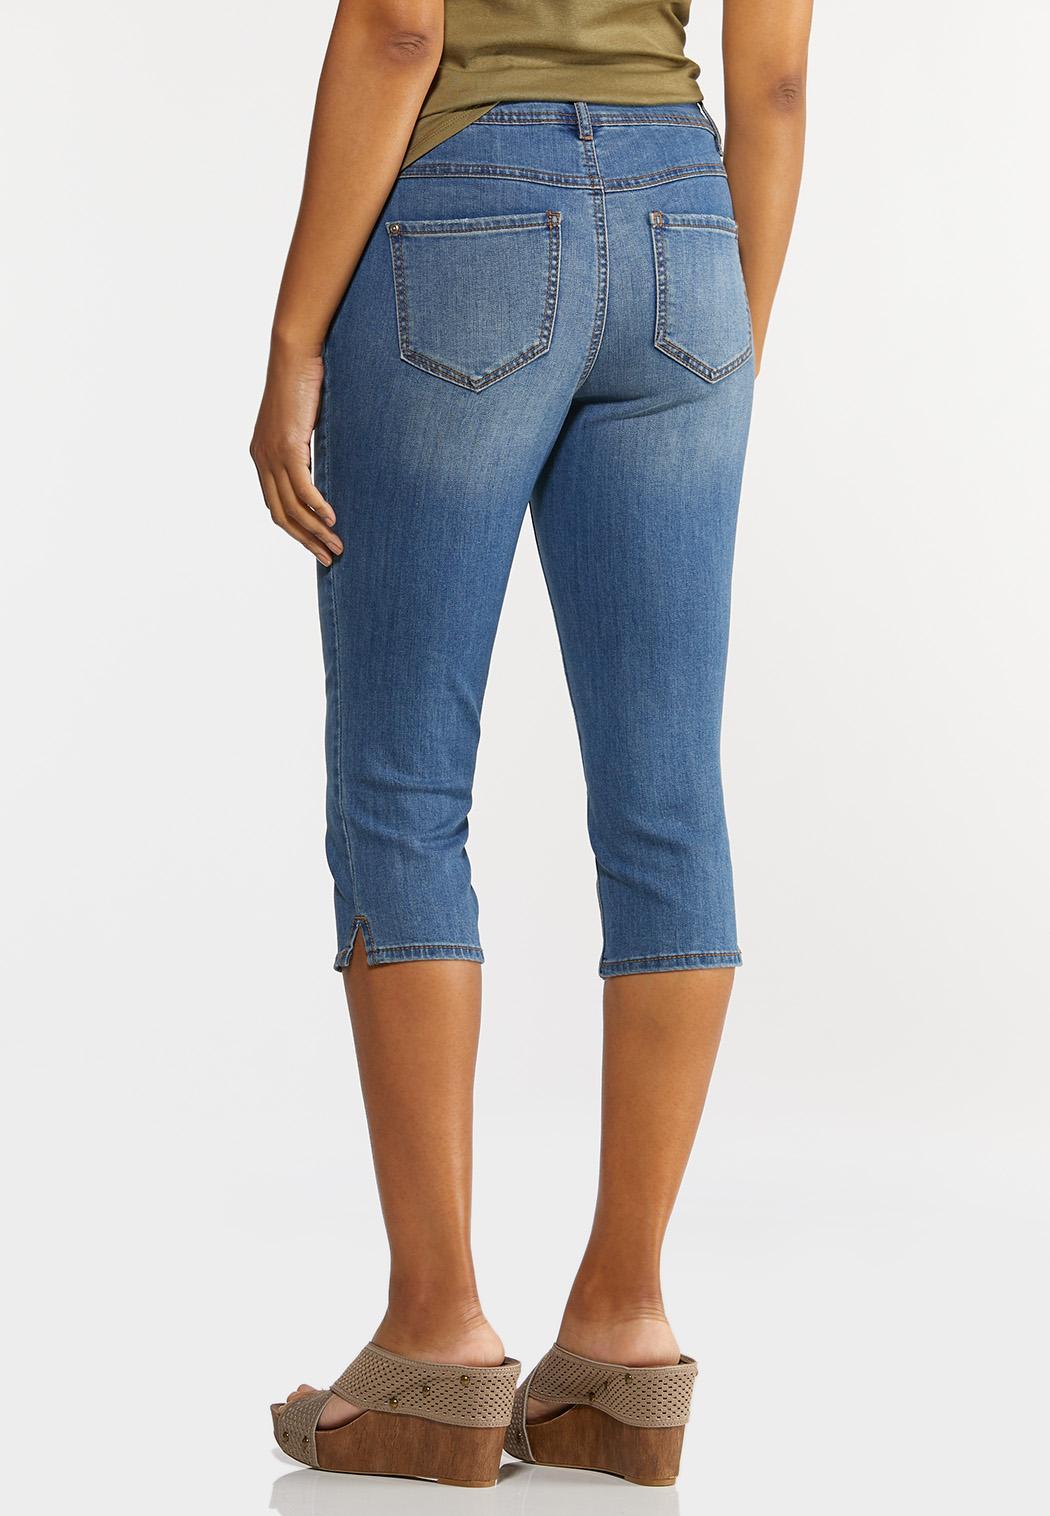 Cropped Skinny Jeans (Item #44240152)